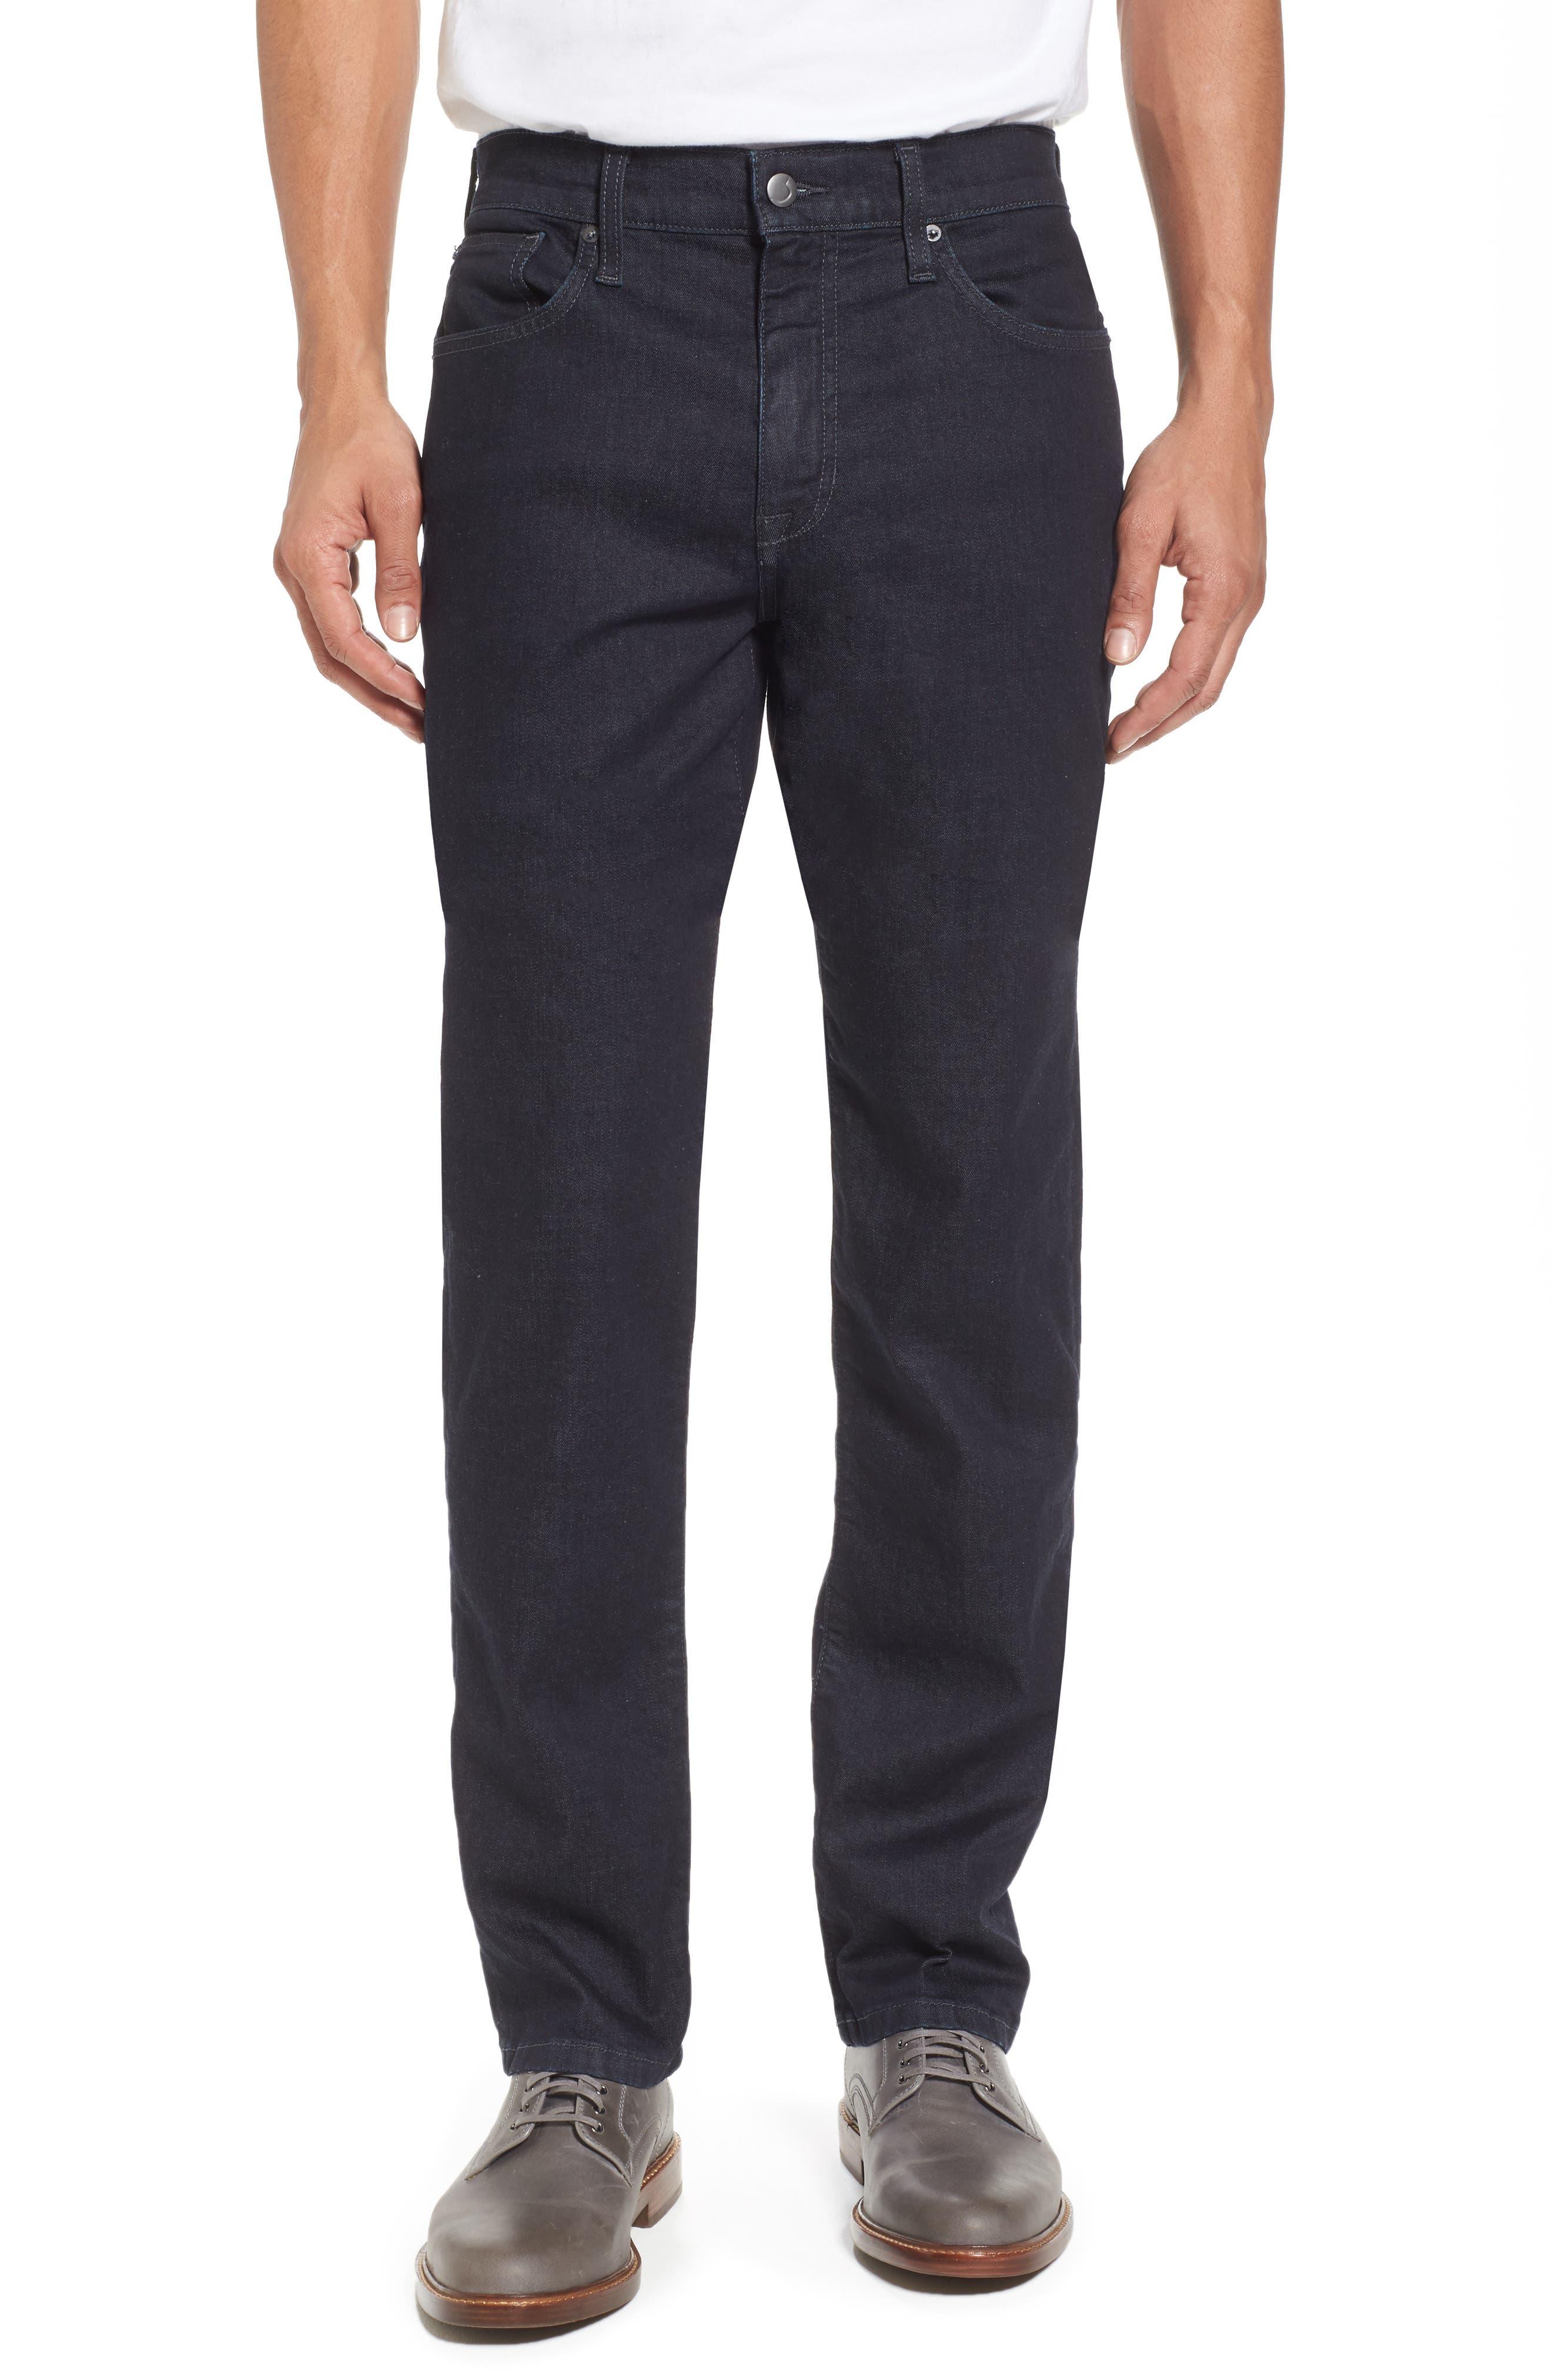 Alternate Image 1 Selected - Joe's Brixton Slim Straight Leg Jeans (Hart)